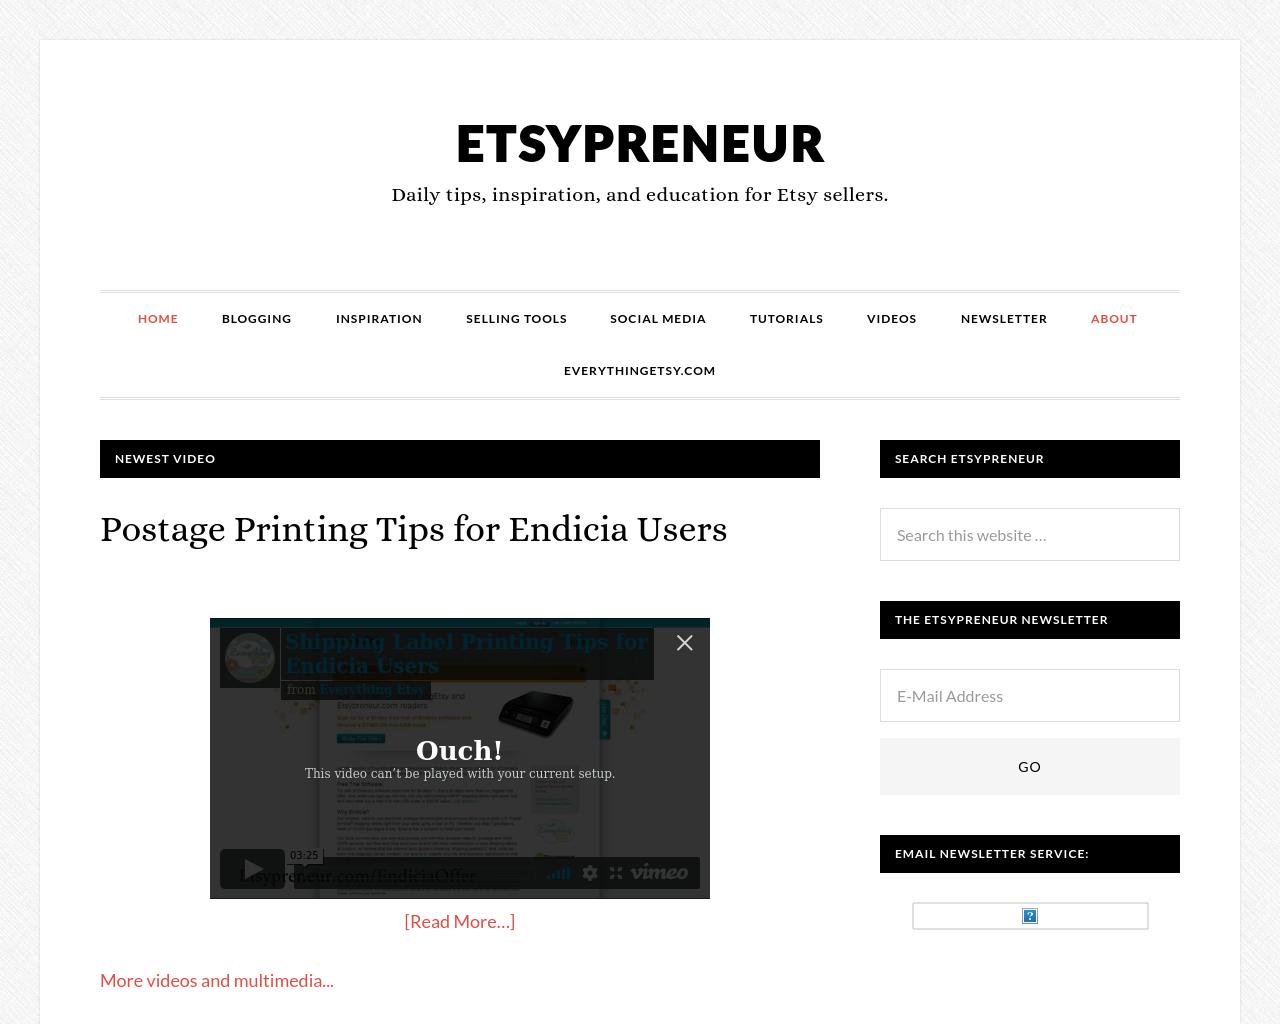 Etsypreneur-Advertising-Reviews-Pricing